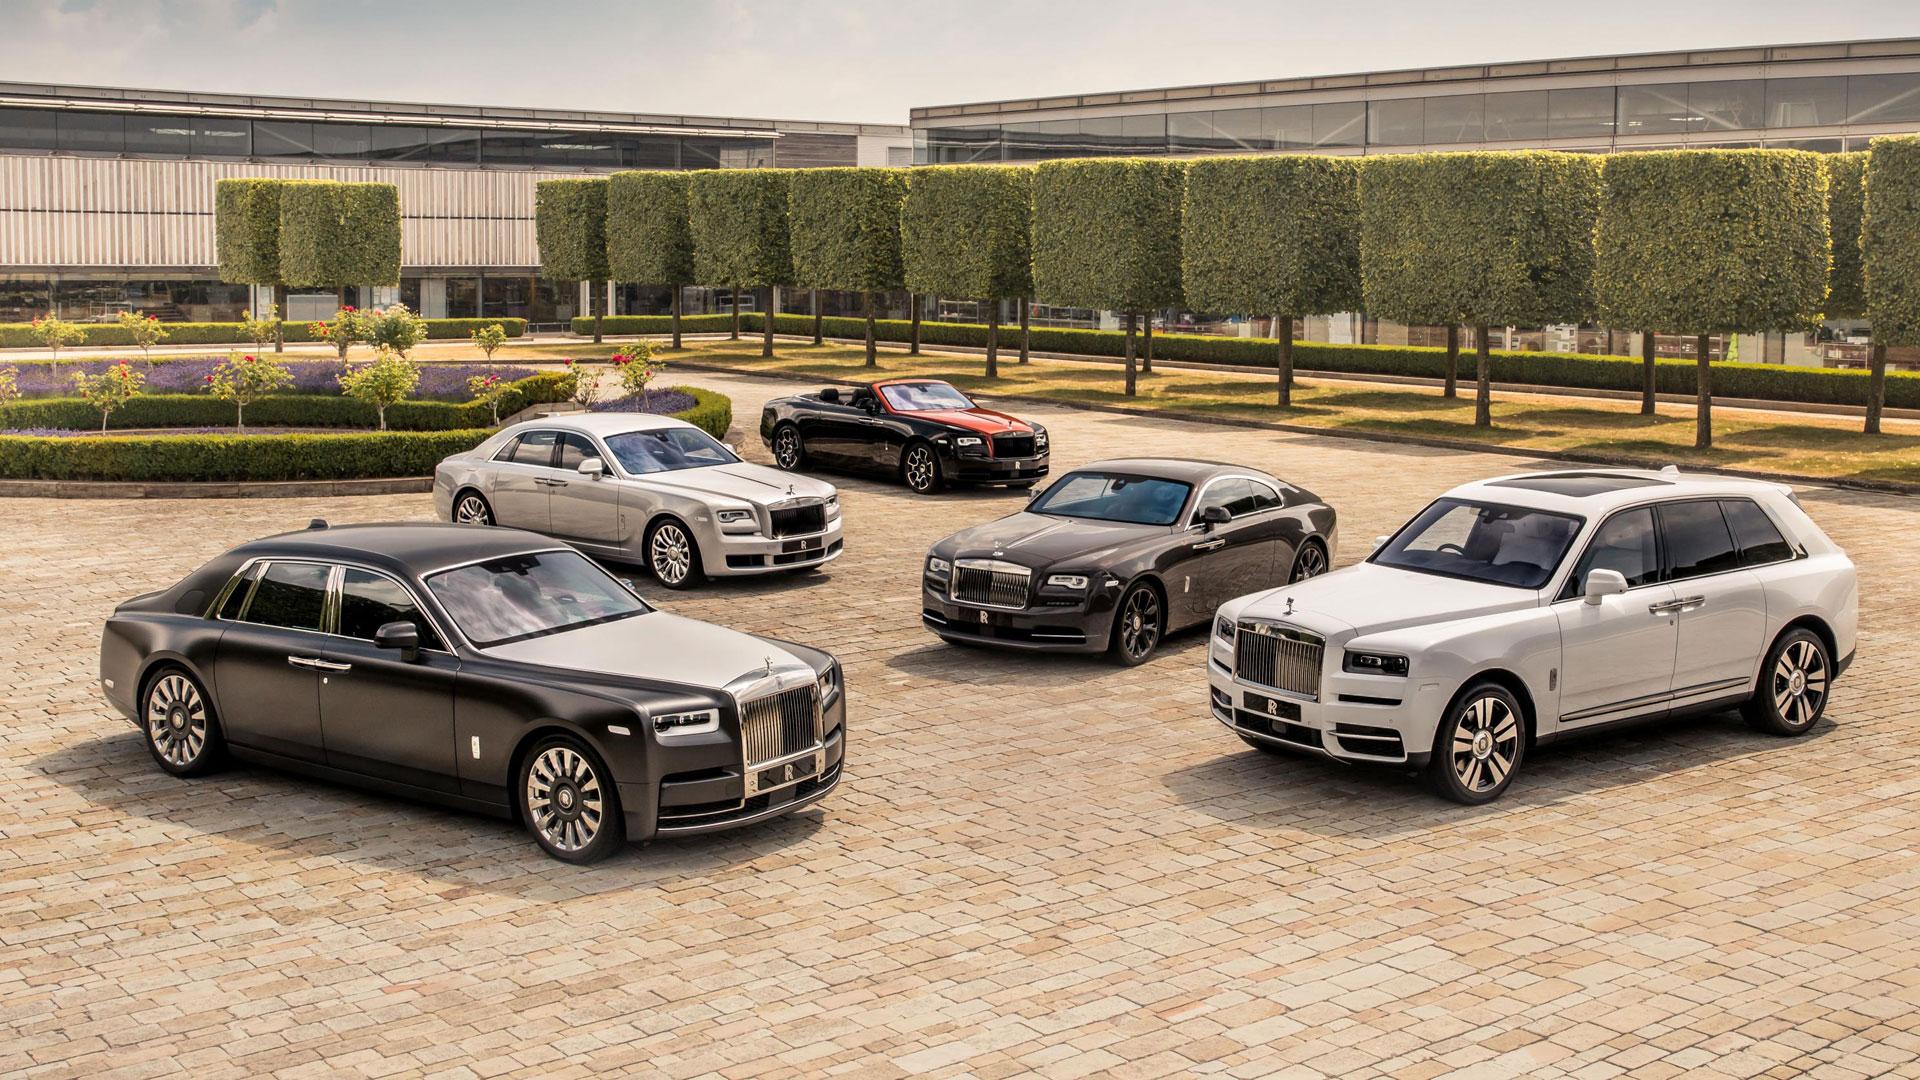 Rolls-Royce Provenance